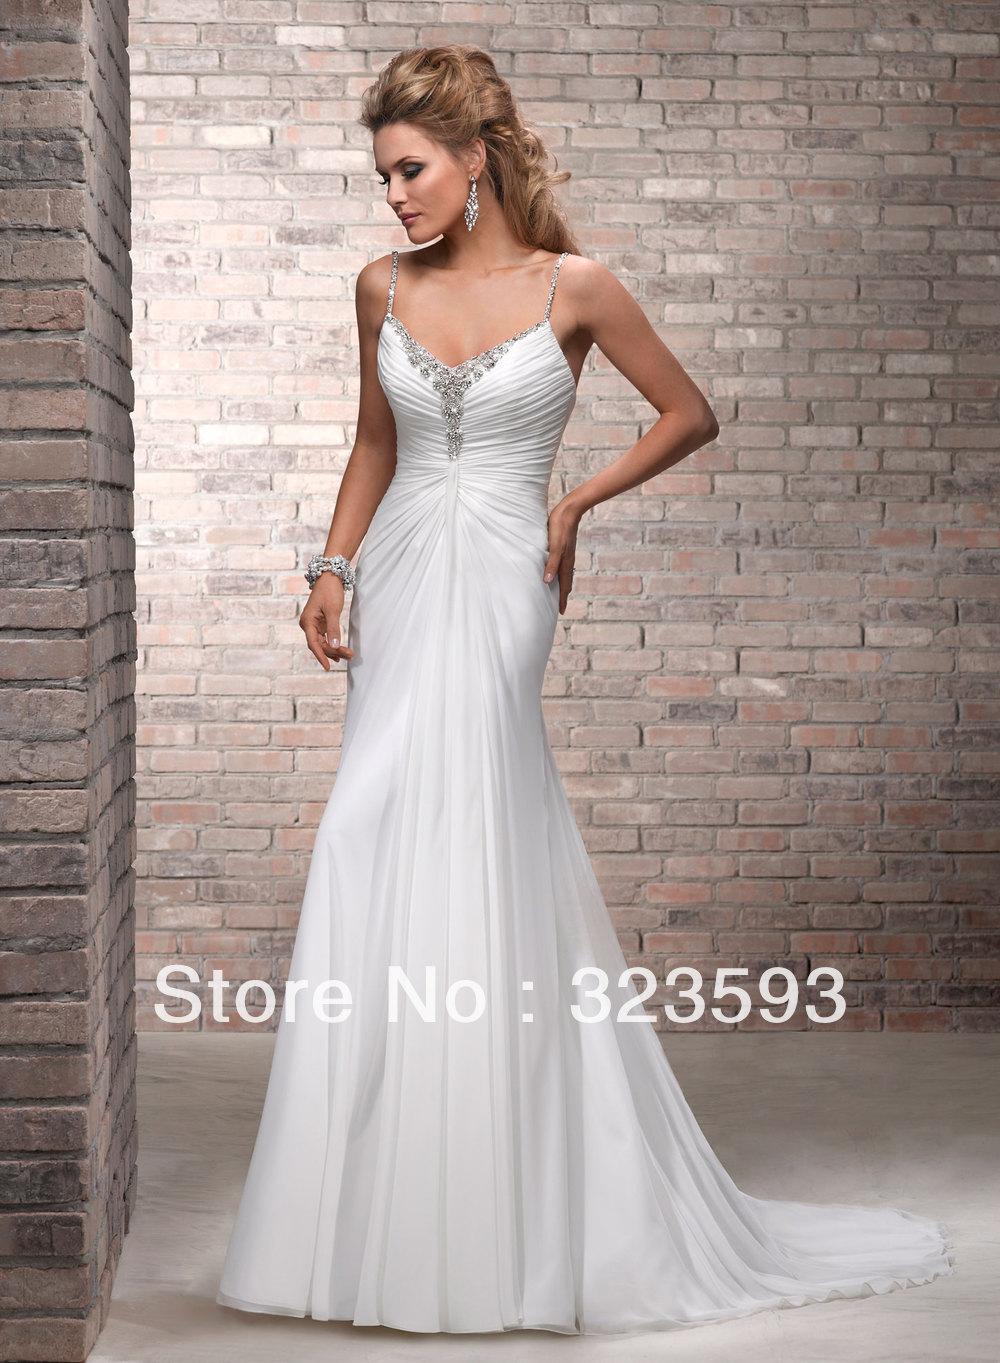 Rhinestone Wedding Dresses 46